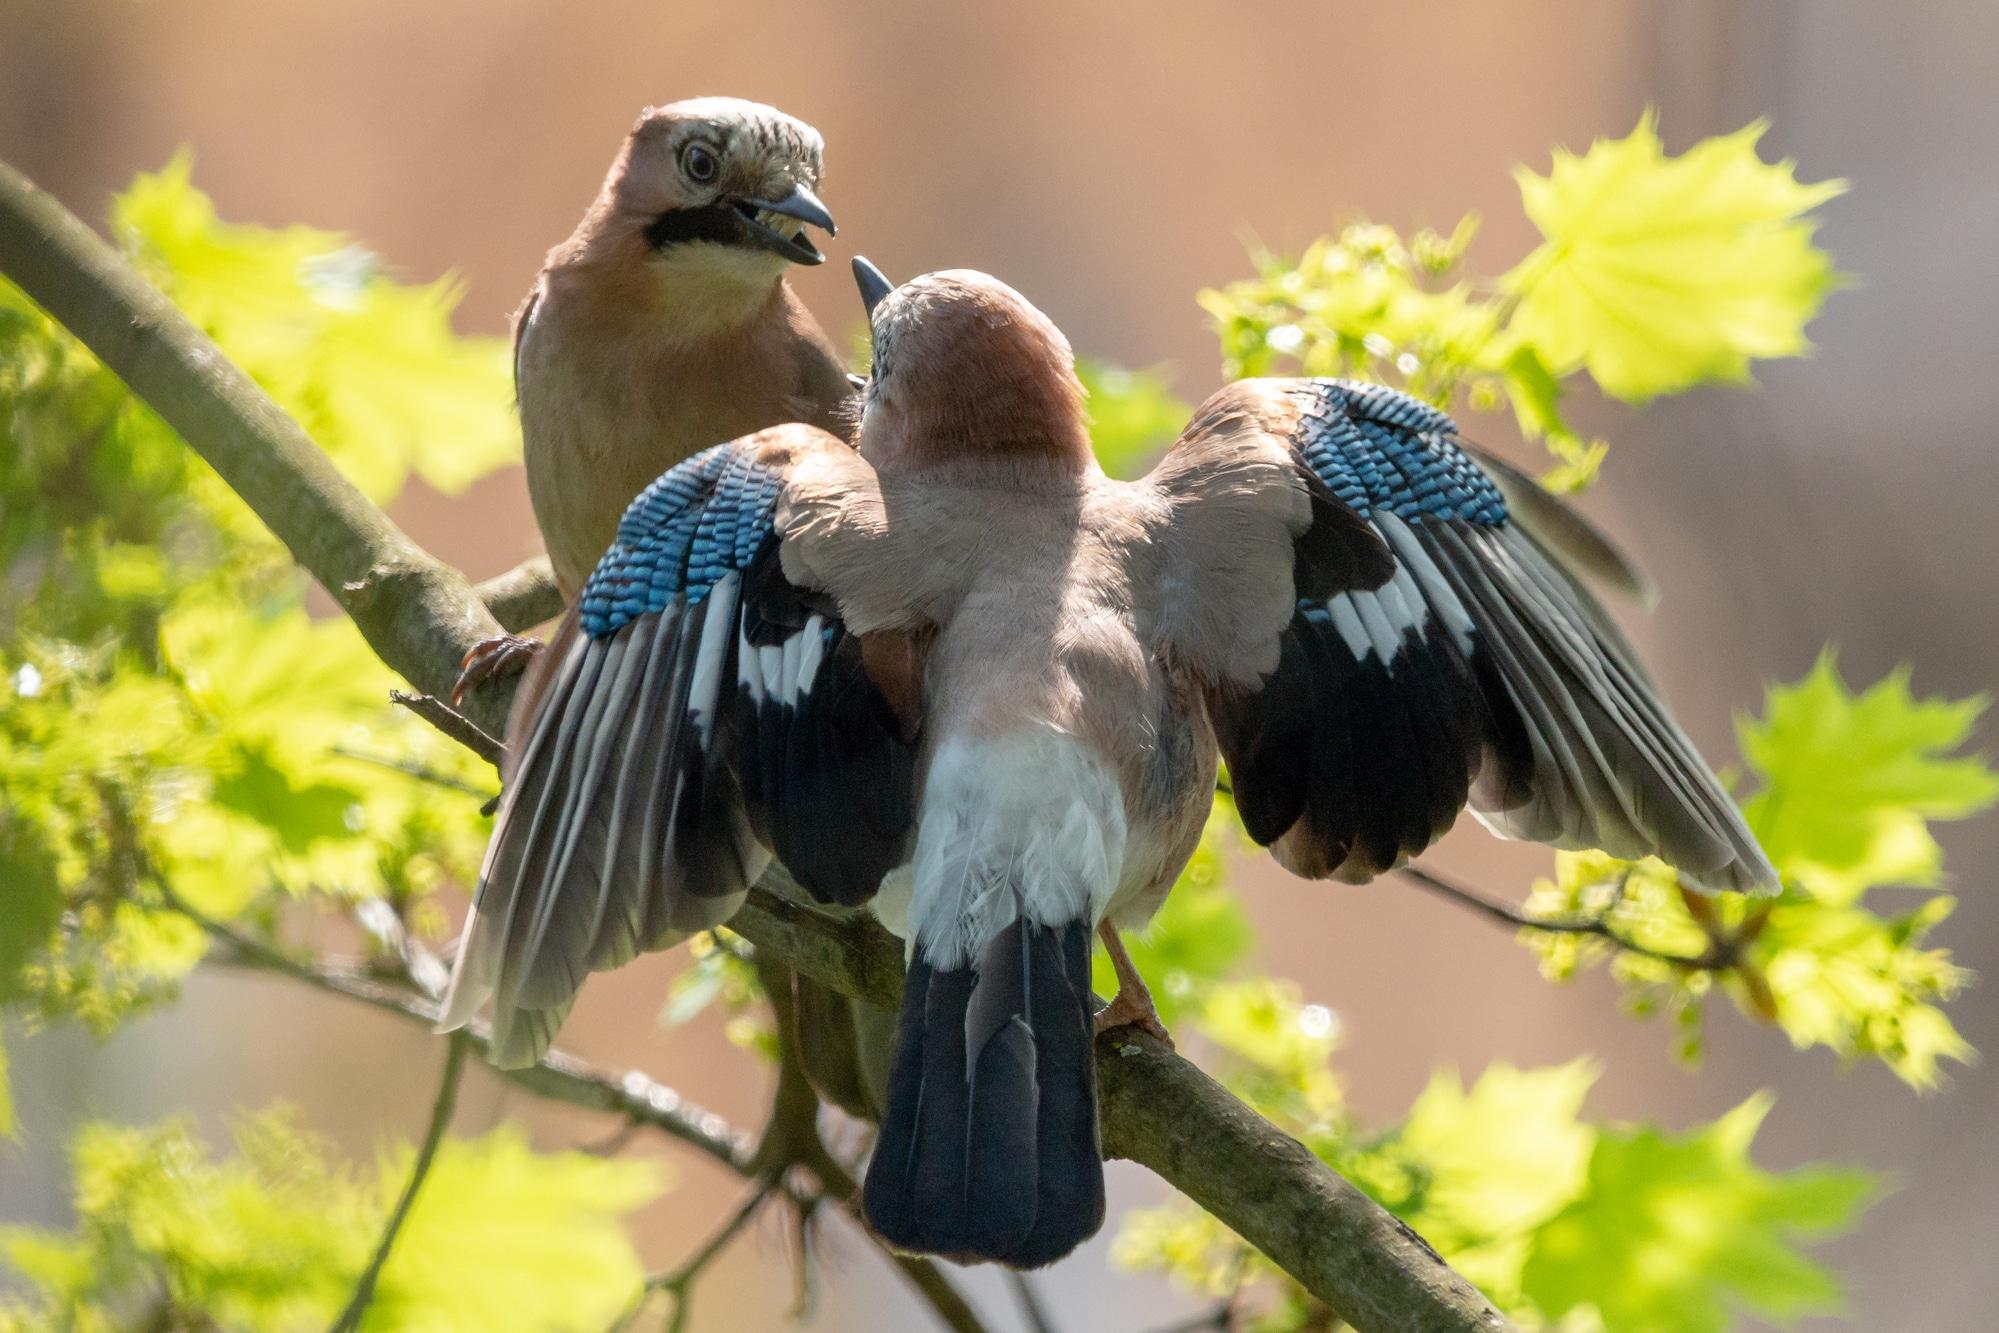 Eurasian jays mating habit. Courtship ritual of pair of jay